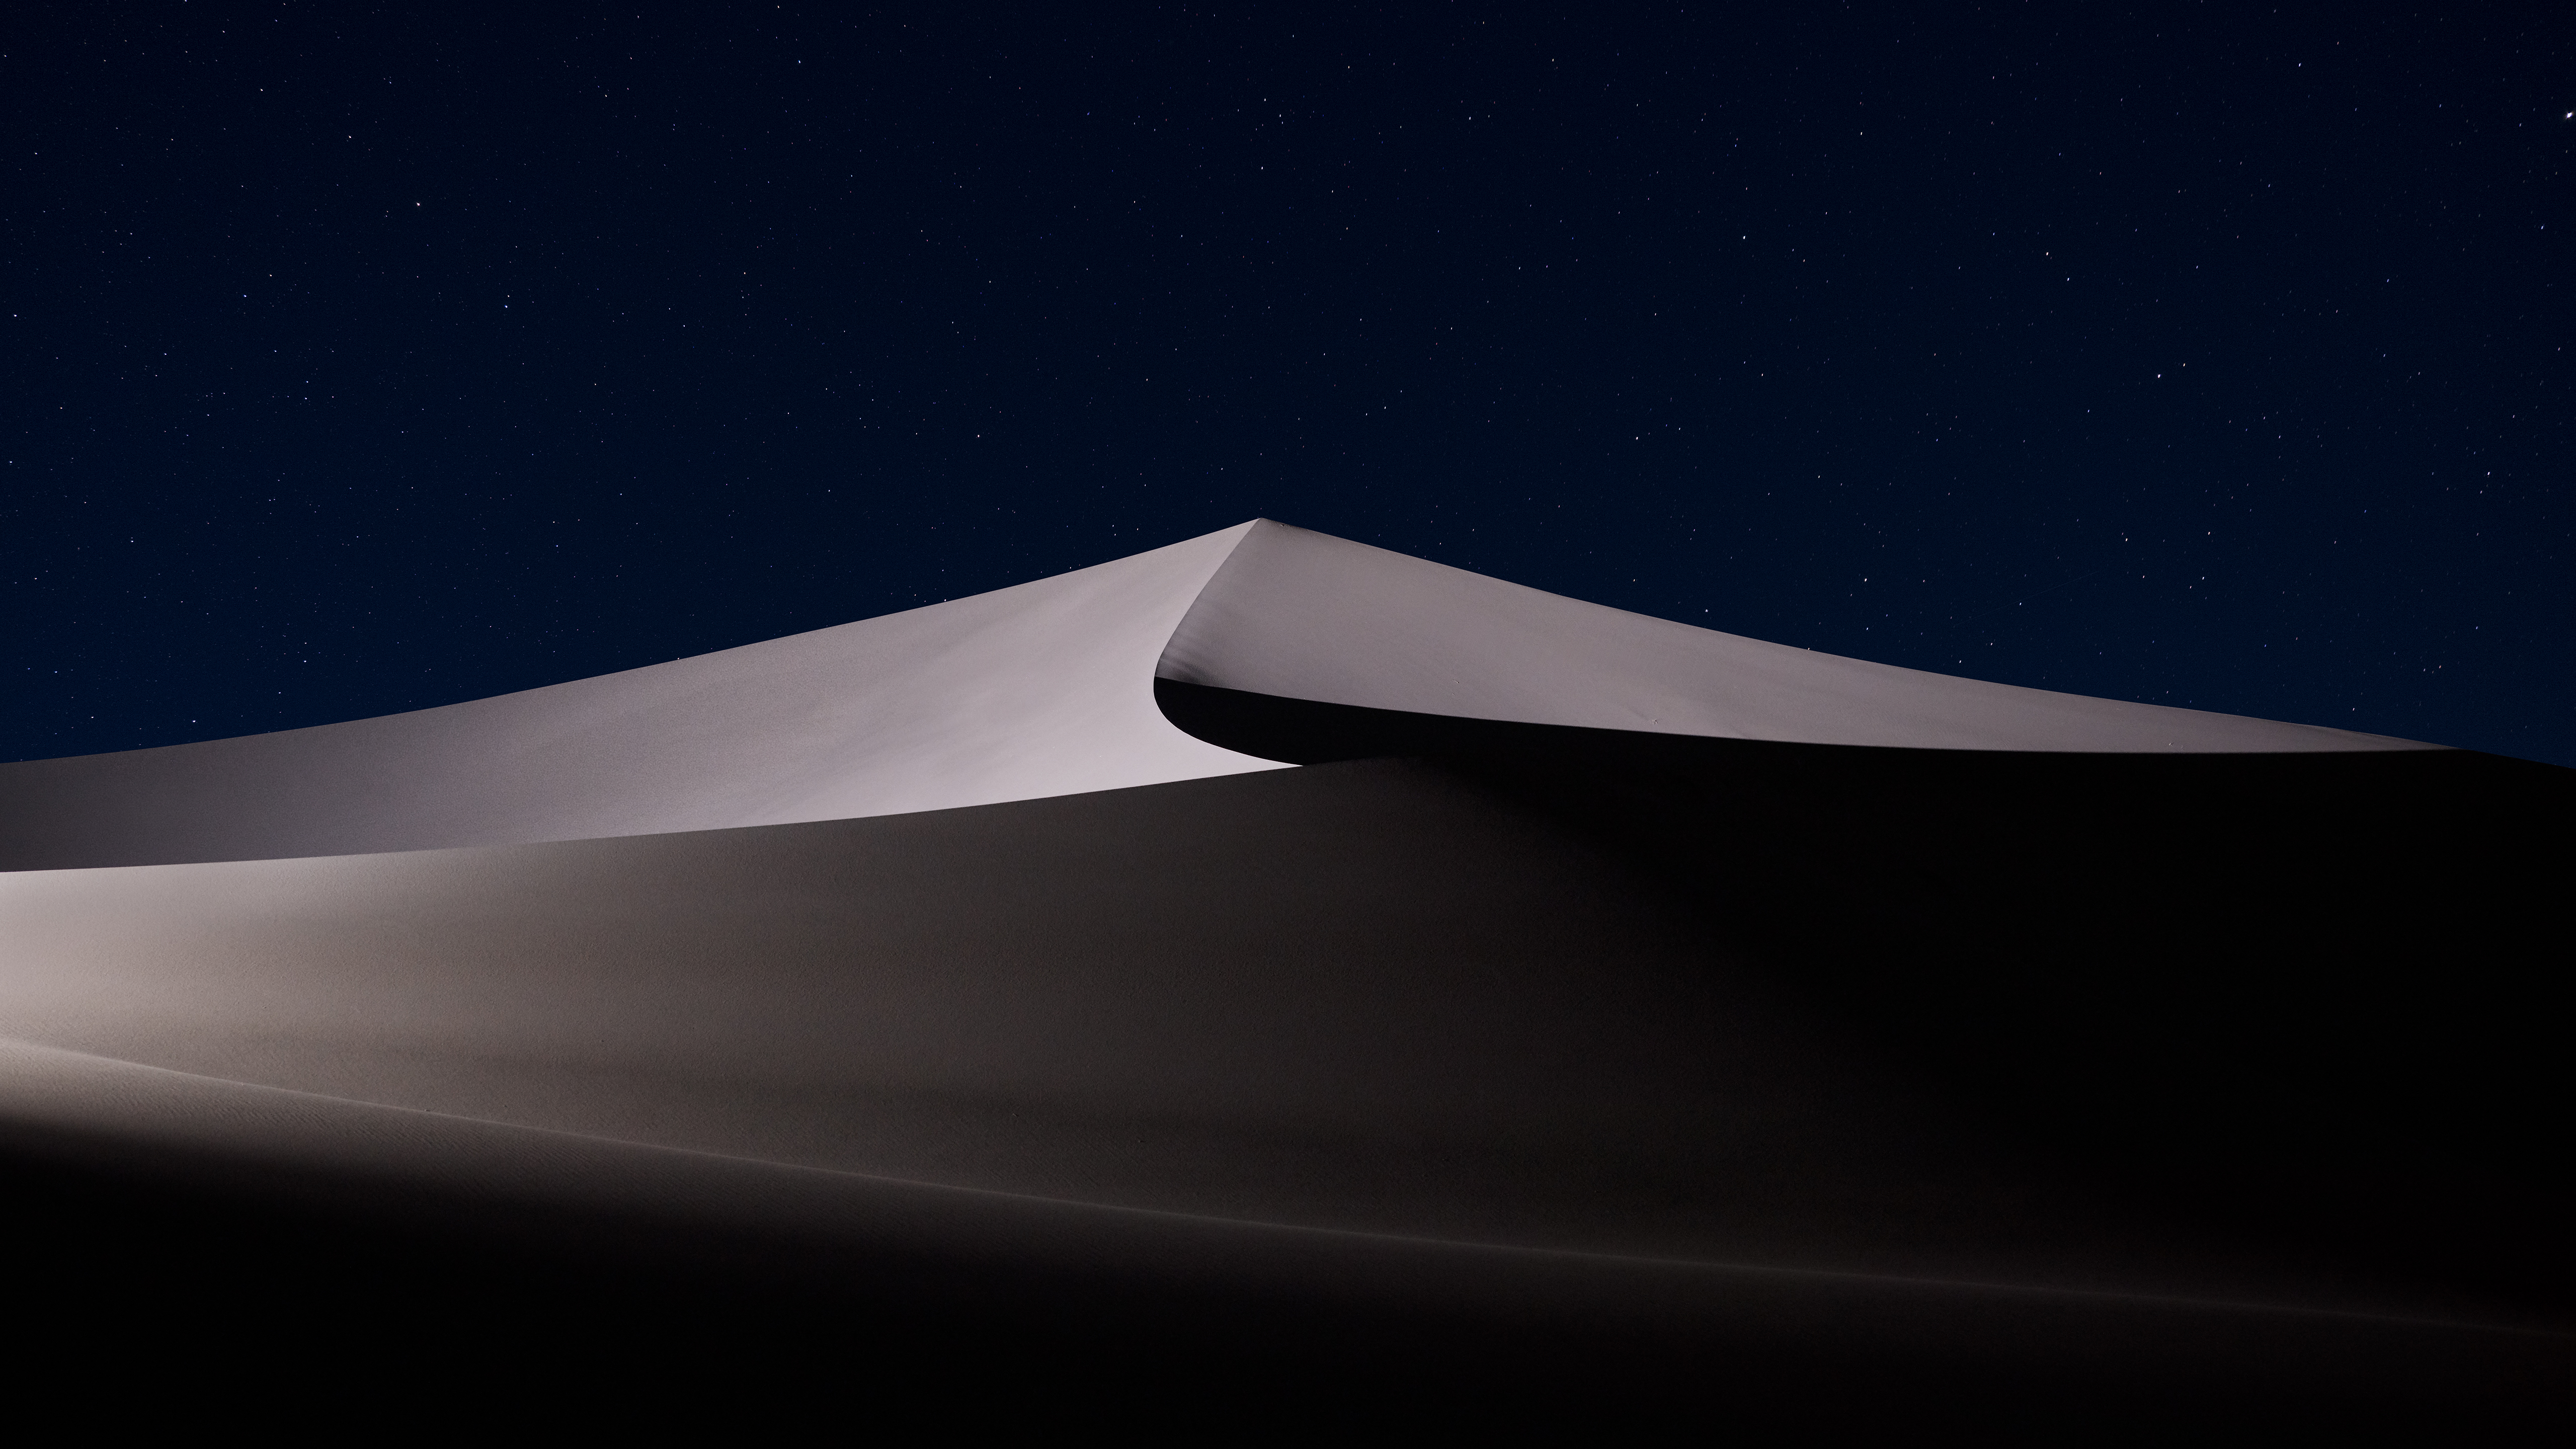 2560x1700 Desert Night Macos Mojave 5k Chromebook Pixel Hd